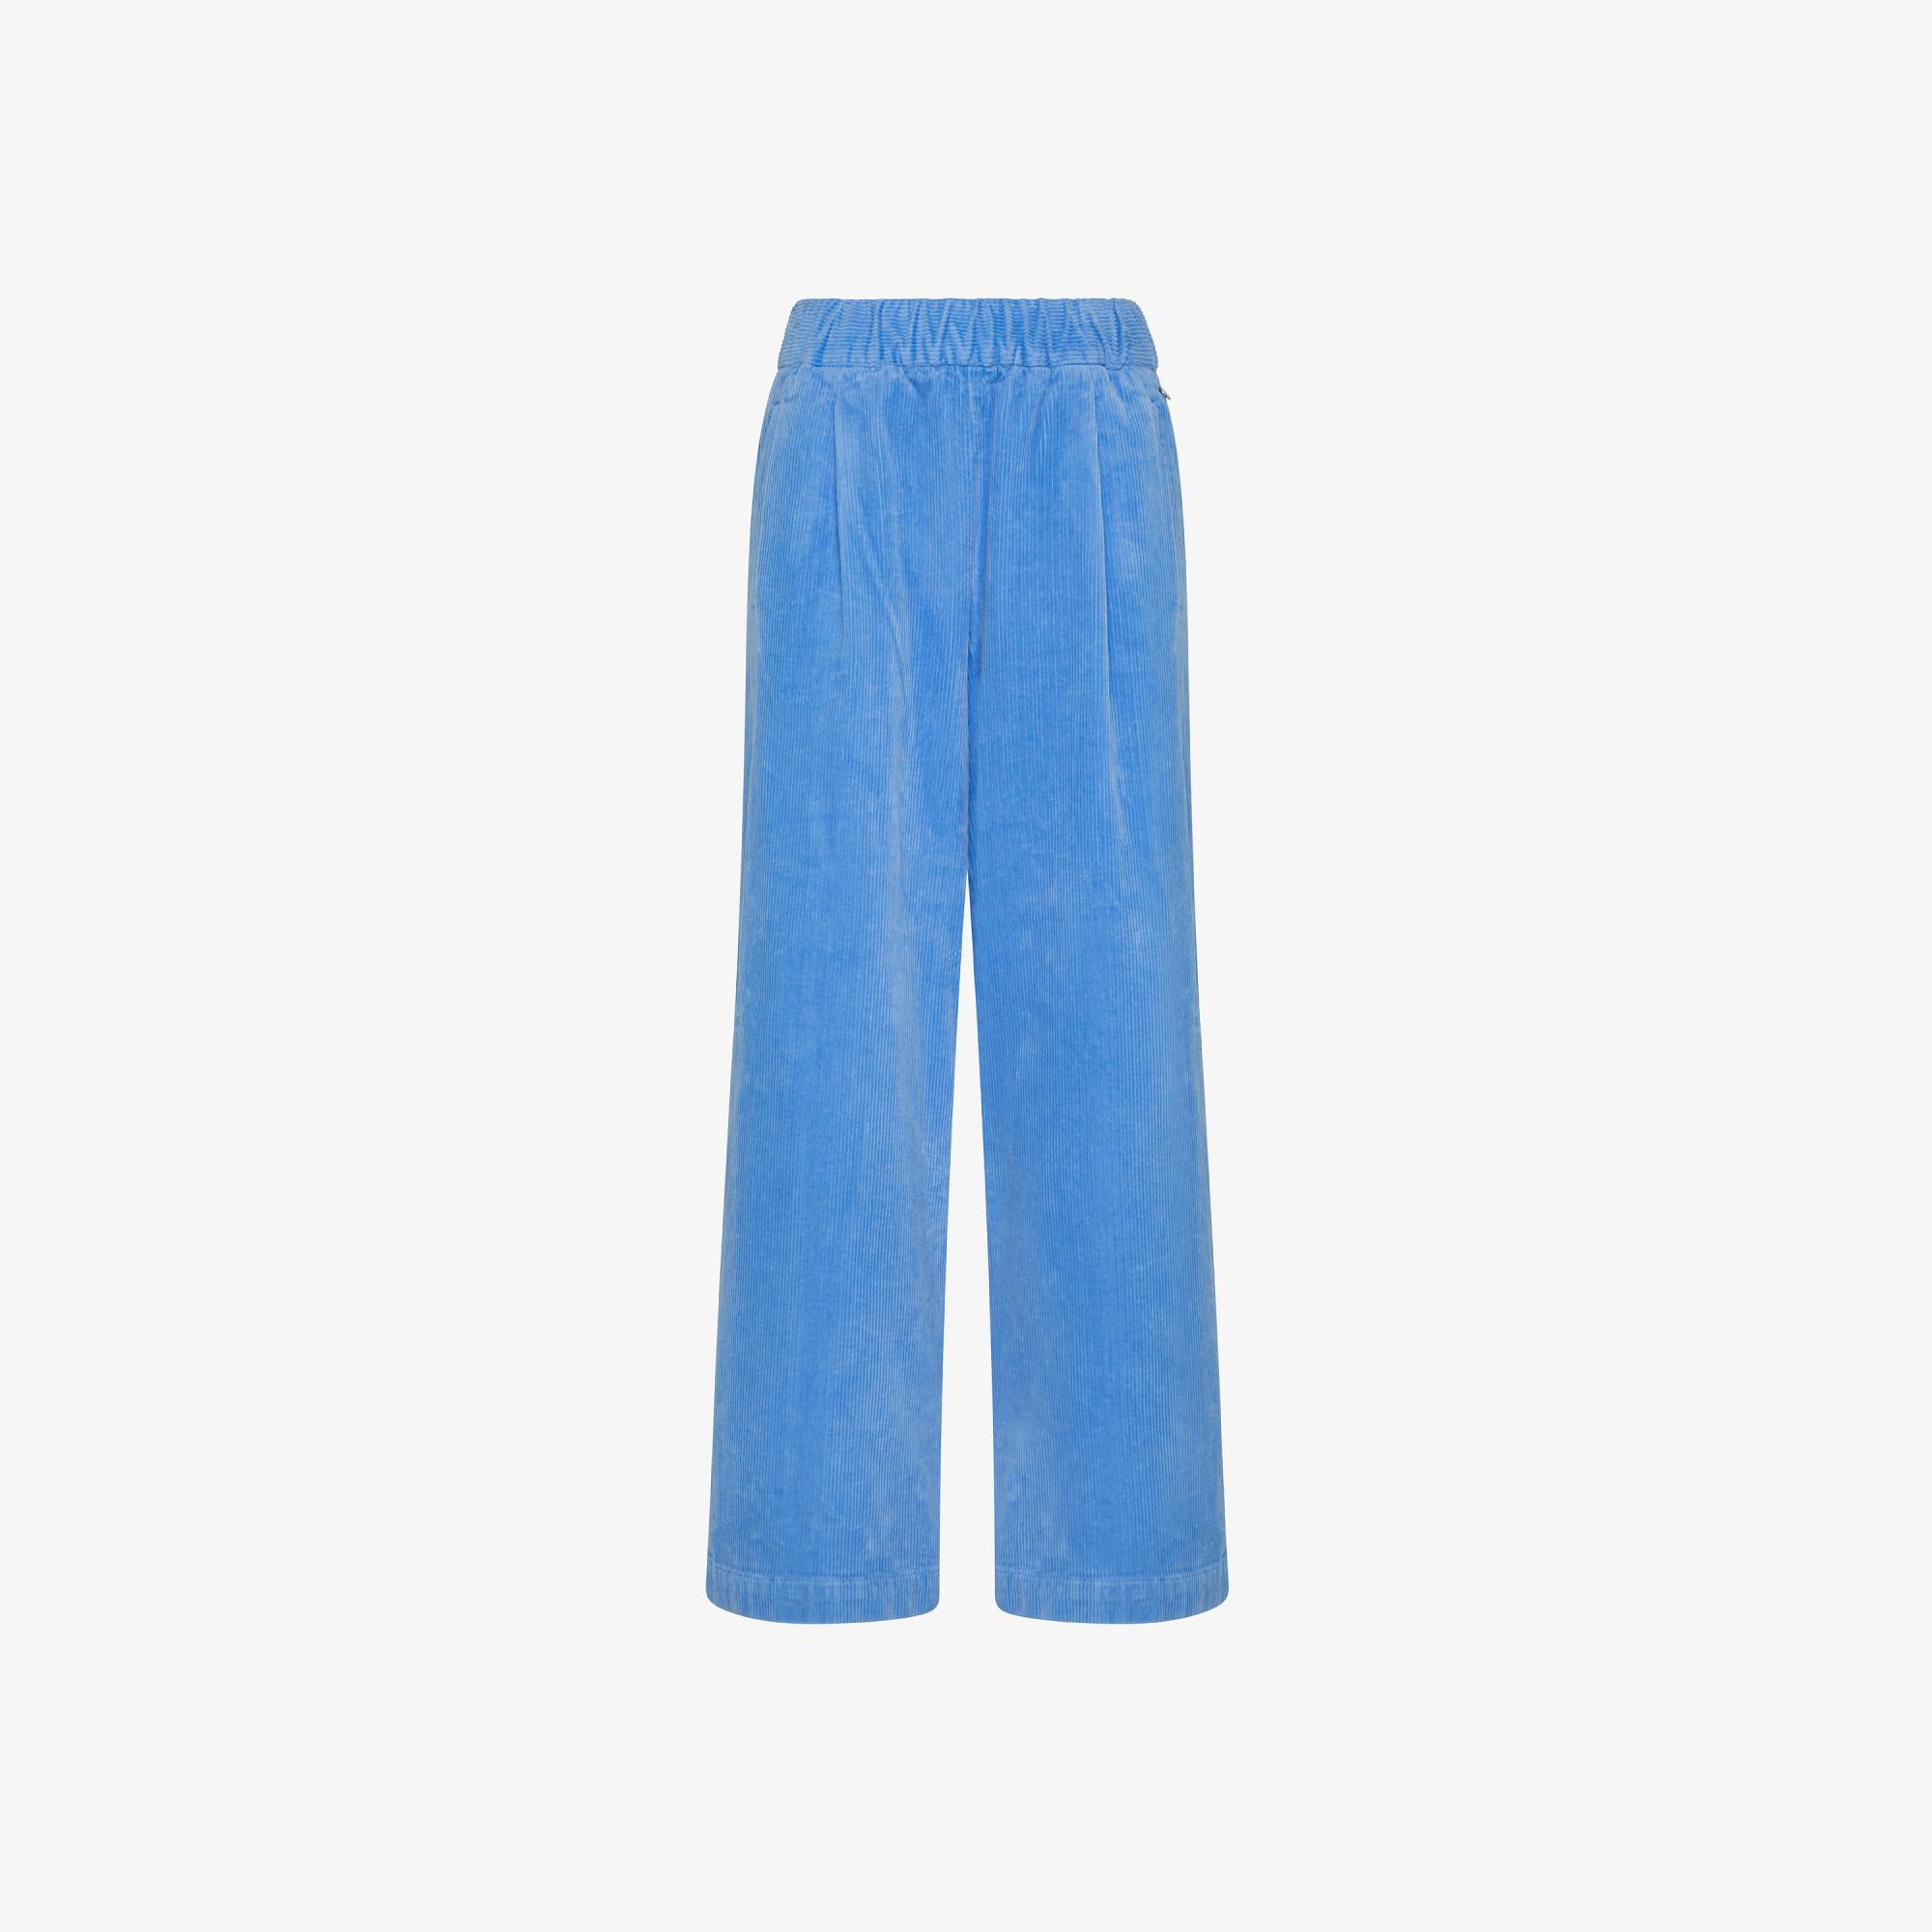 PANT WIDE LEGS CORDUROY BLUE